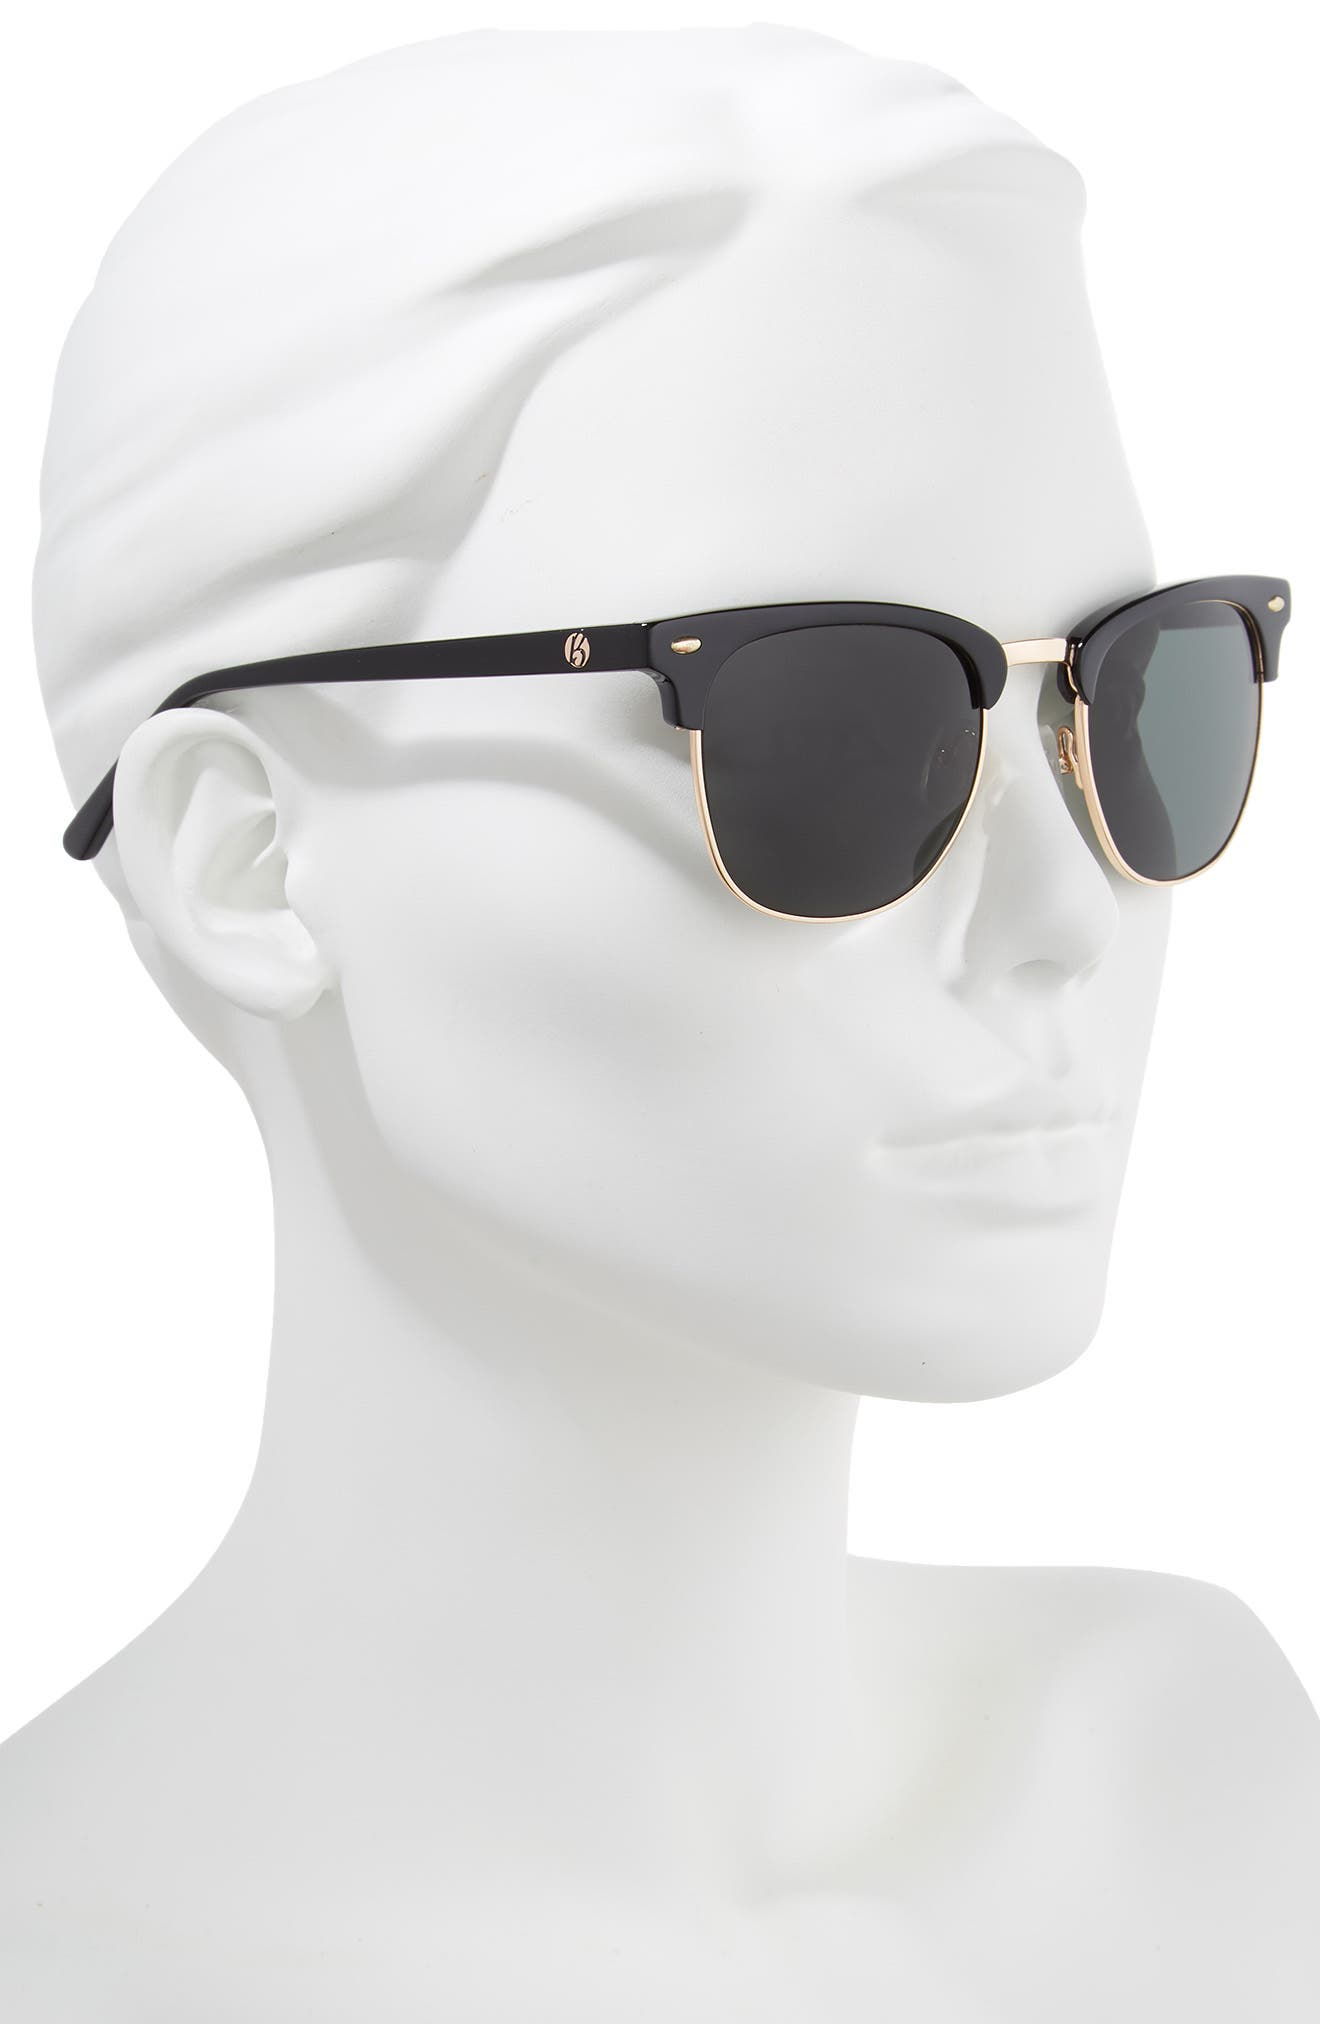 Copeland 51mm Sunglasses,                             Alternate thumbnail 2, color,                             BLACK/ GREY